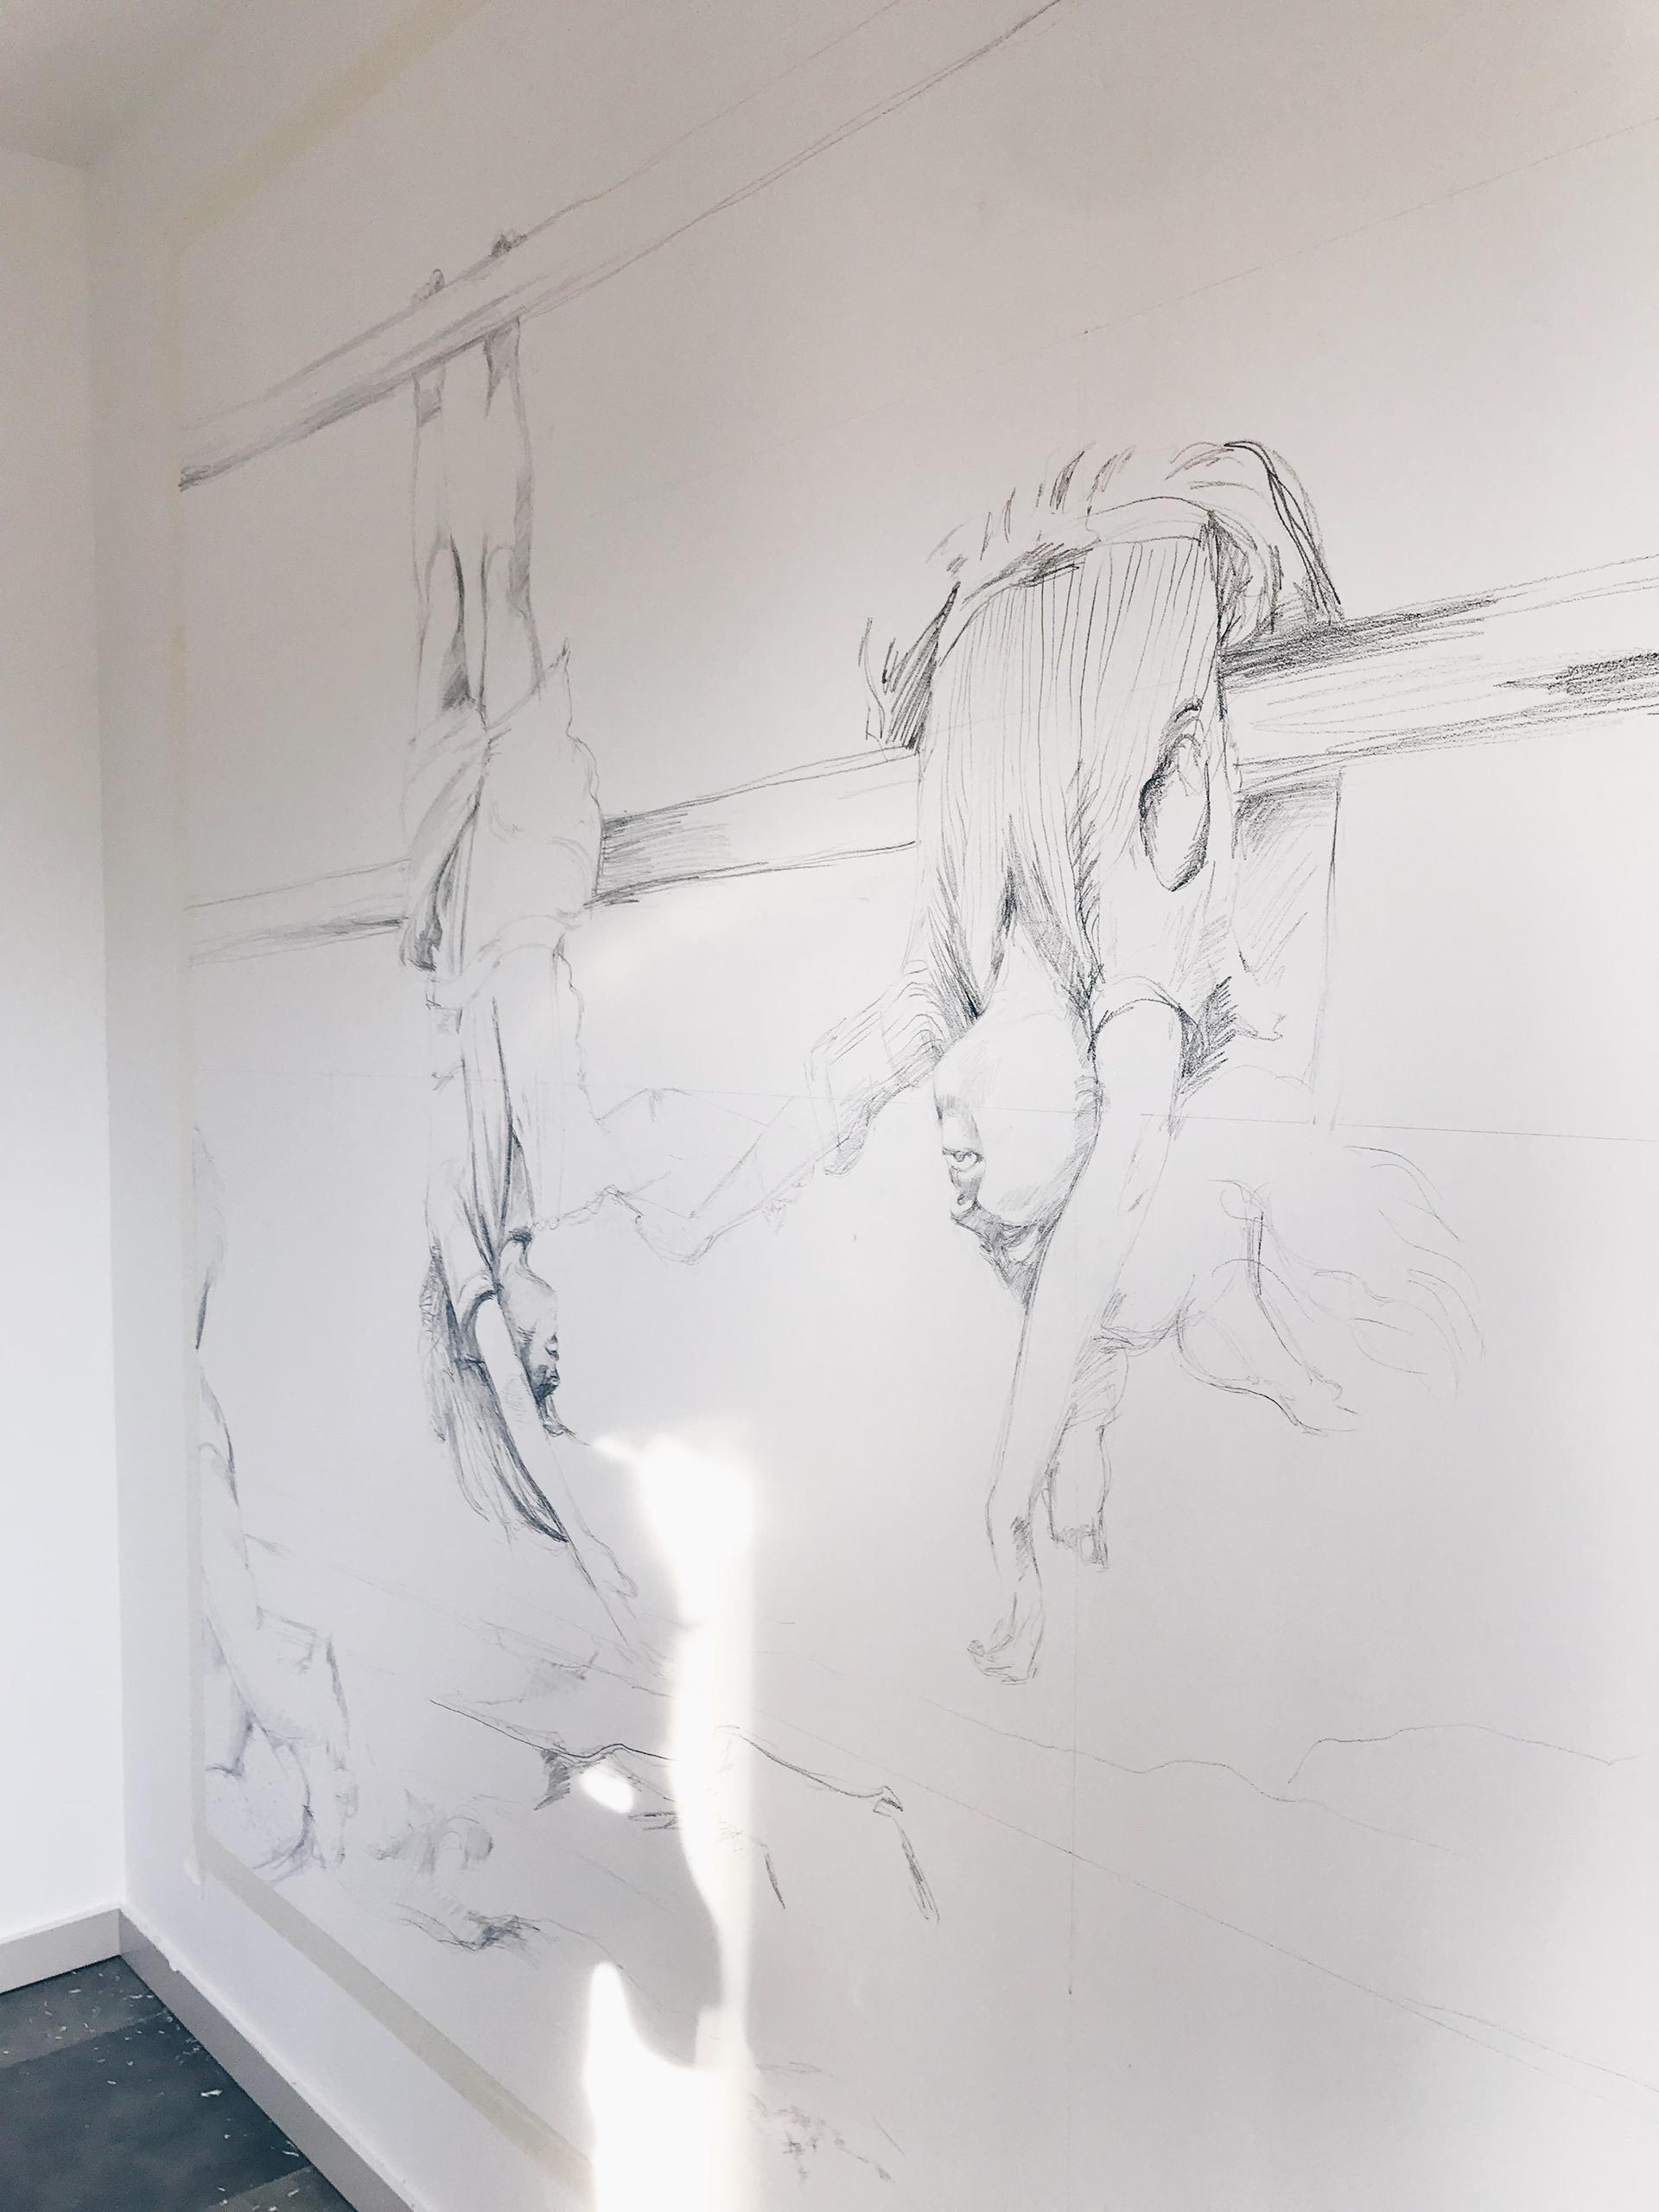 Fine Arts,Interior Design,Illustration